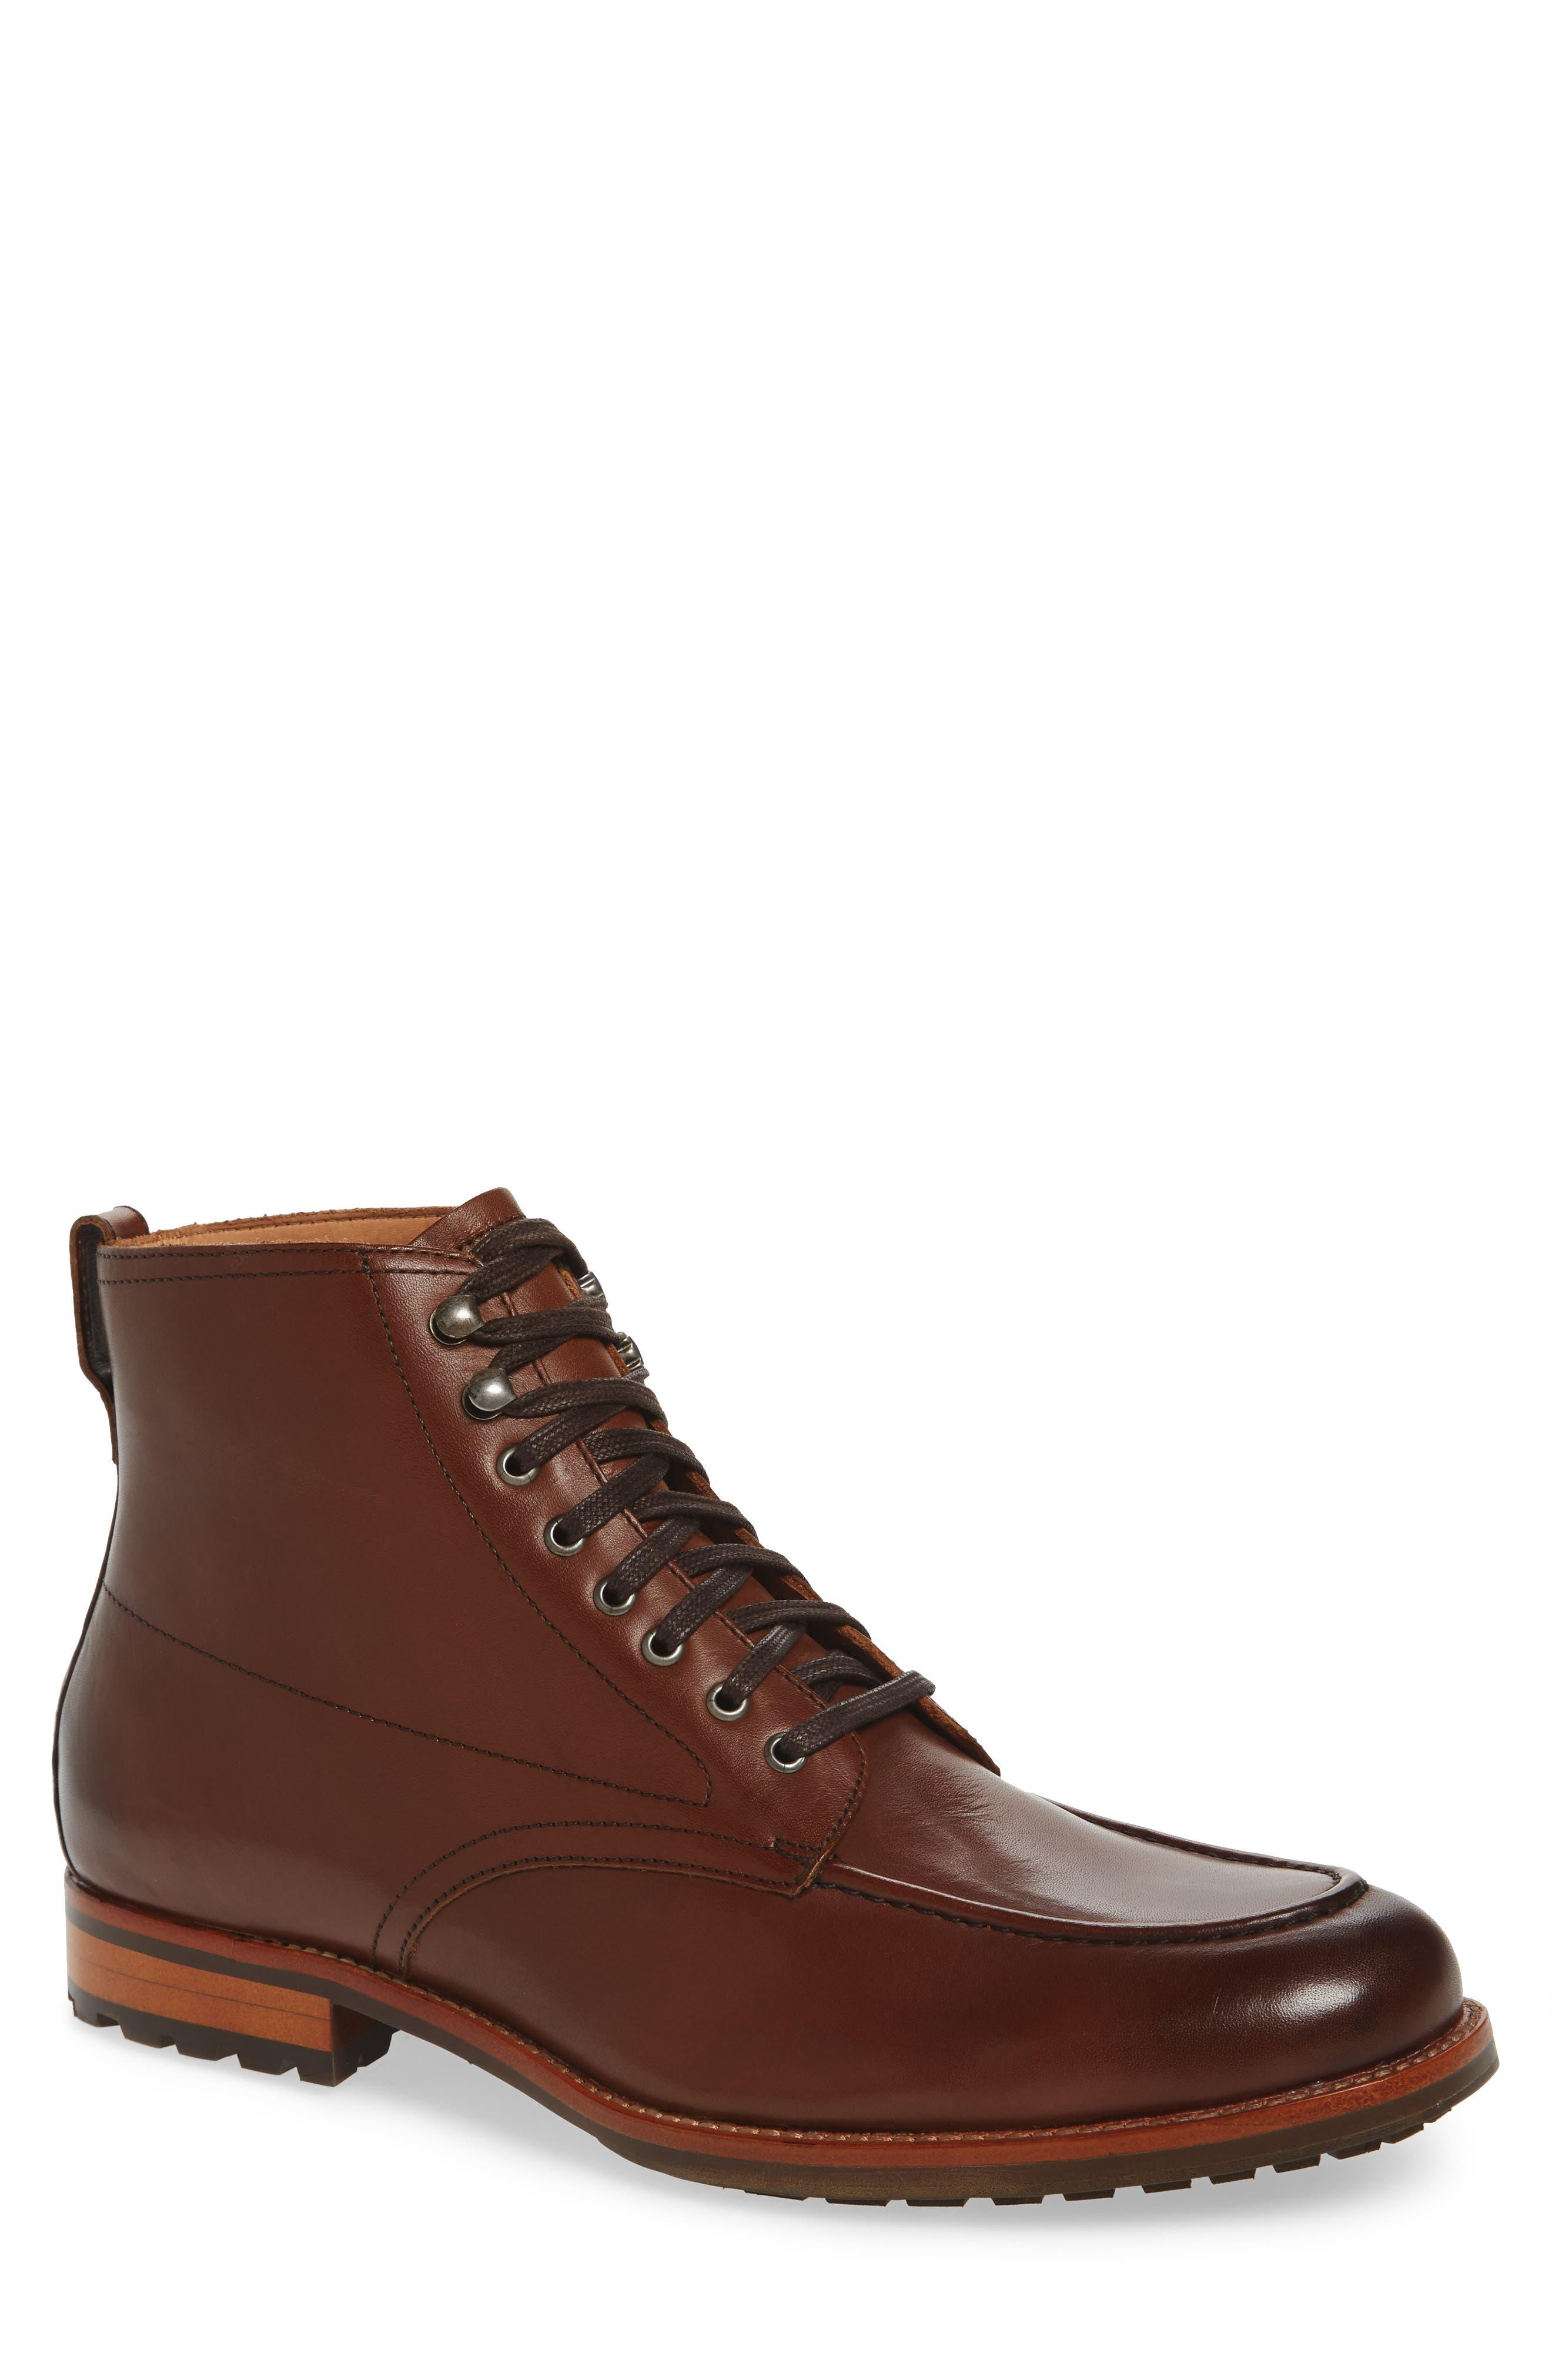 Alamanca Apron Toe Boot, Main, color, 200